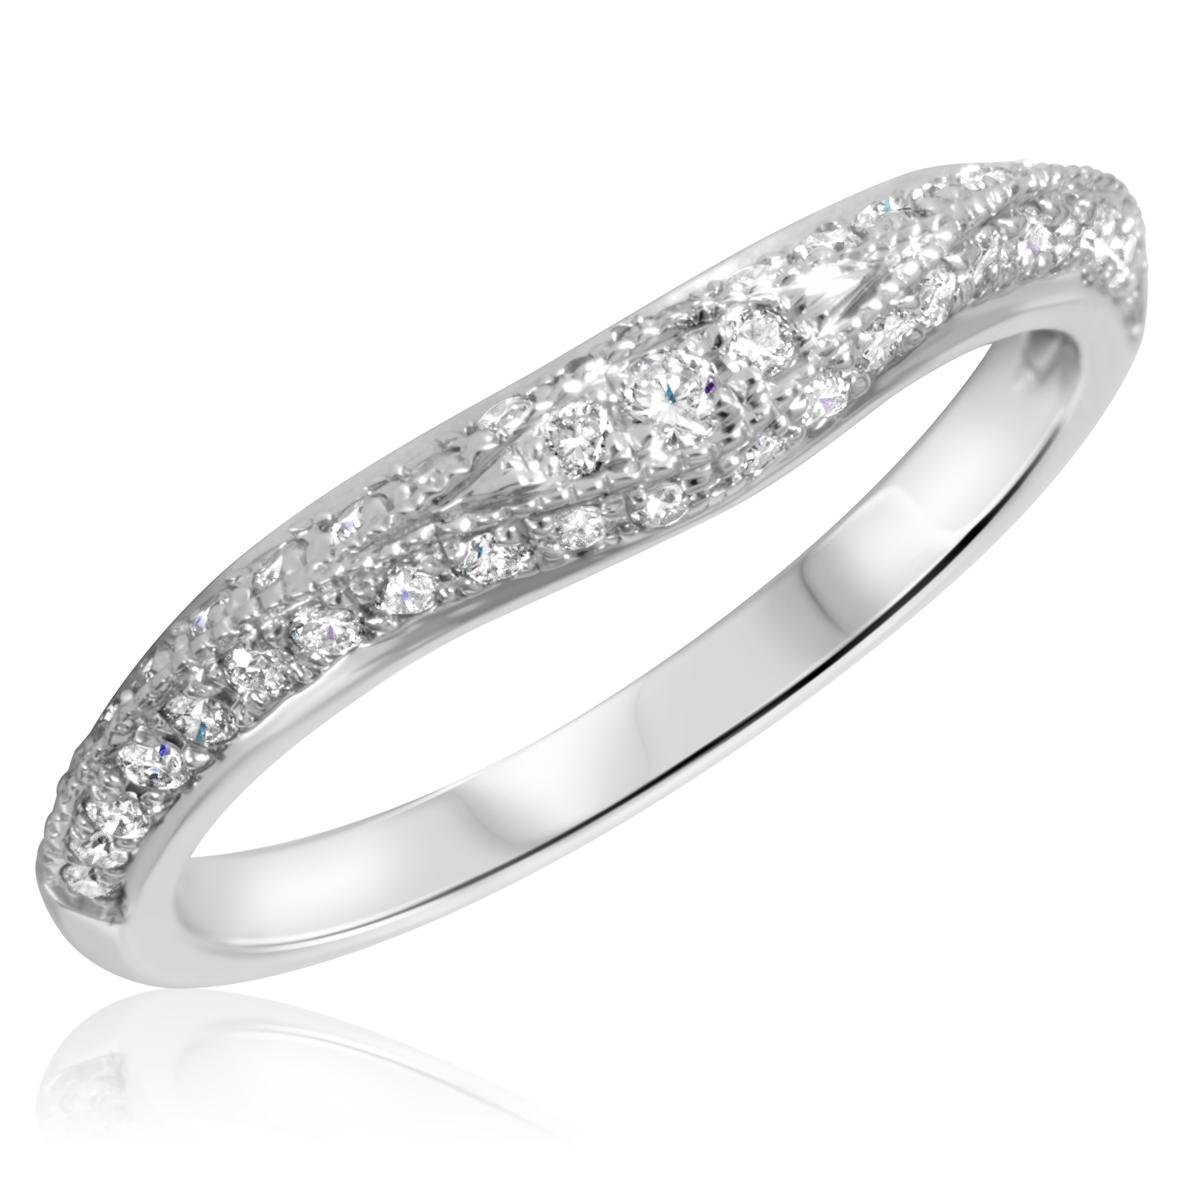 1/3 Carat T.W. Round Cut Diamond Ladies Wedding Band 14K White Gold- Size 8